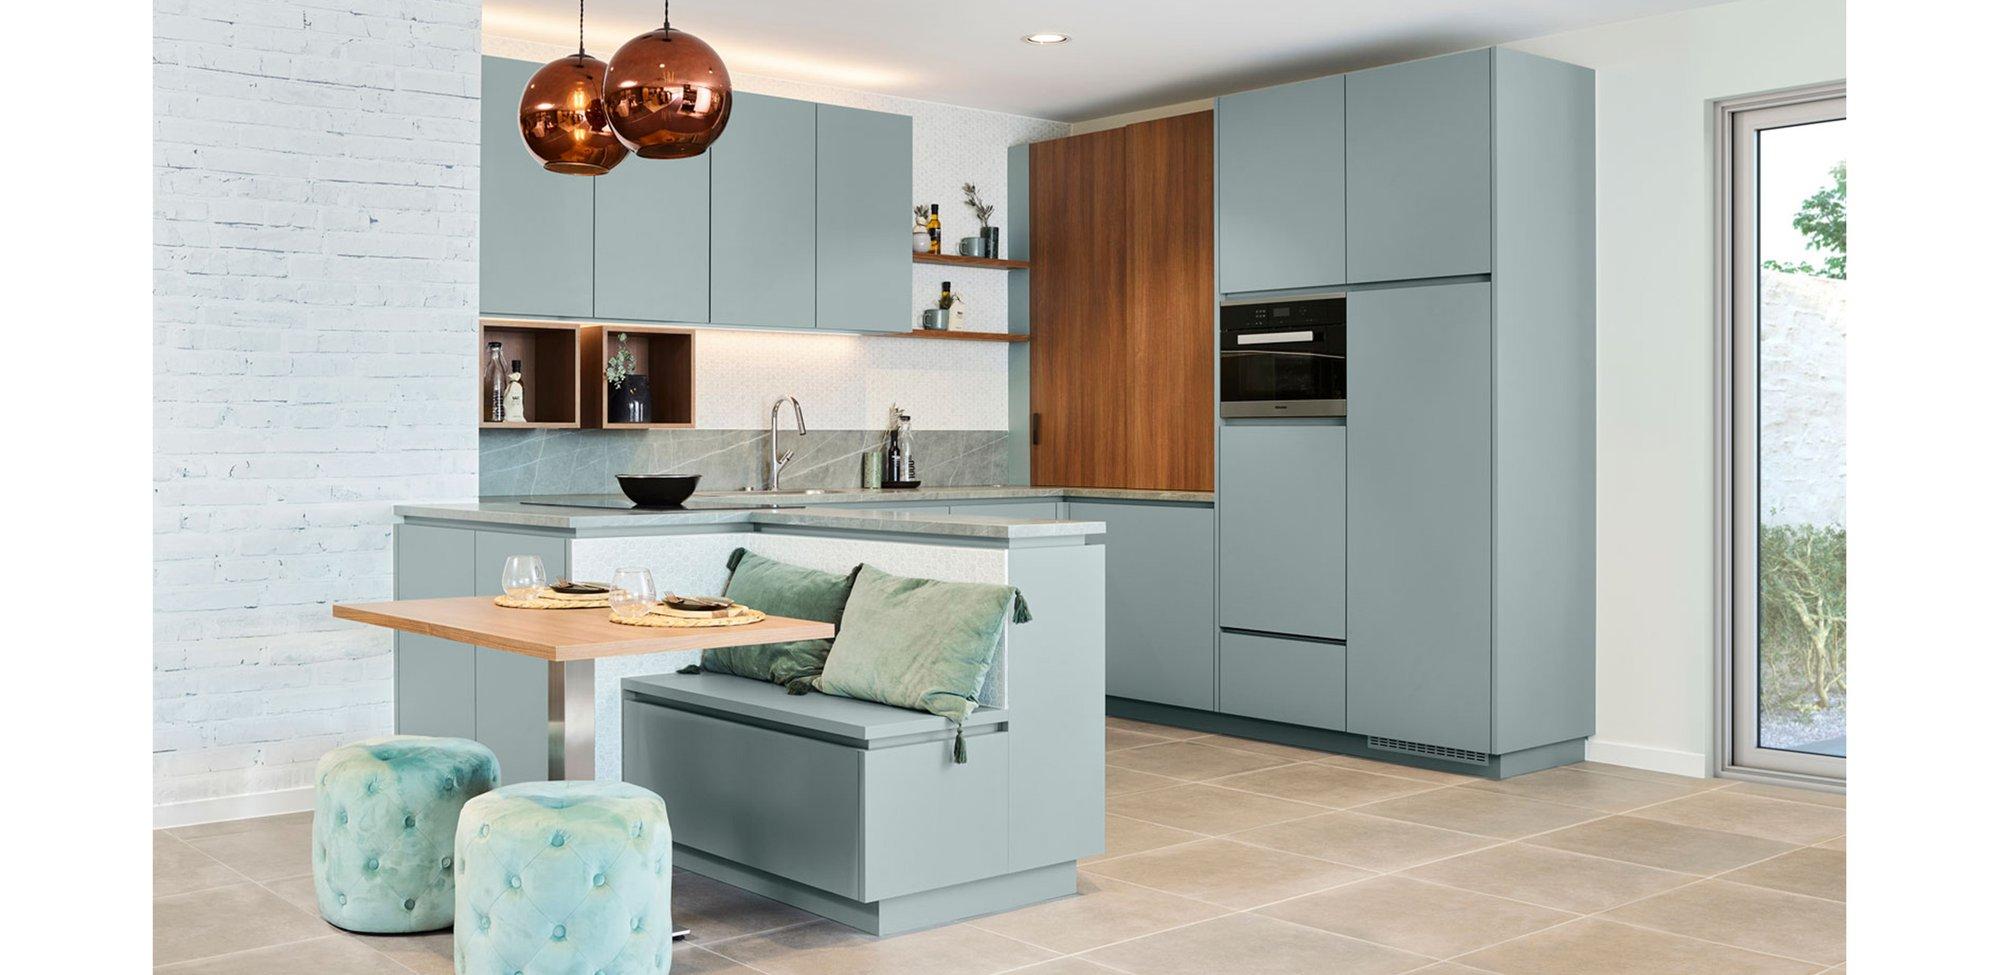 Groene vintage keuken - Model Design